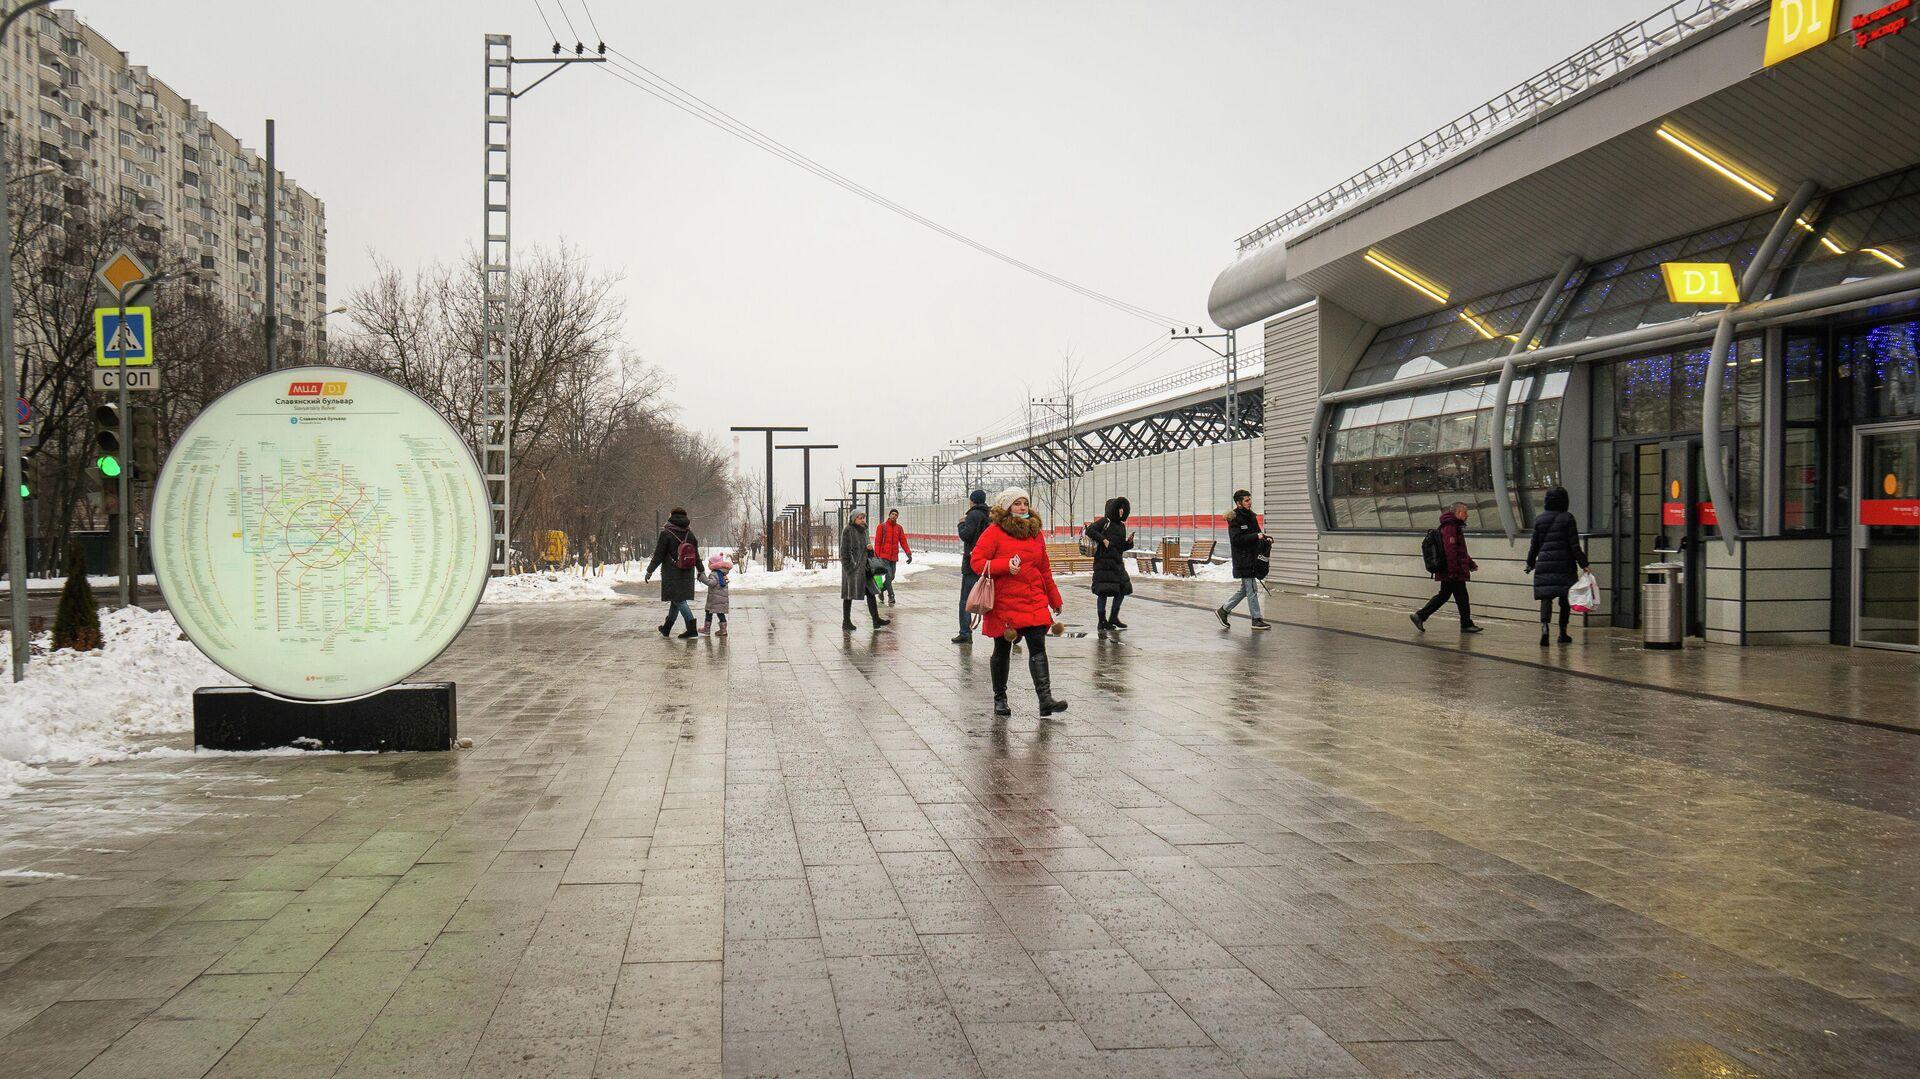 Благоустройство территории возле станций метро и МЦД Славянский бульвар  - РИА Новости, 1920, 24.02.2021